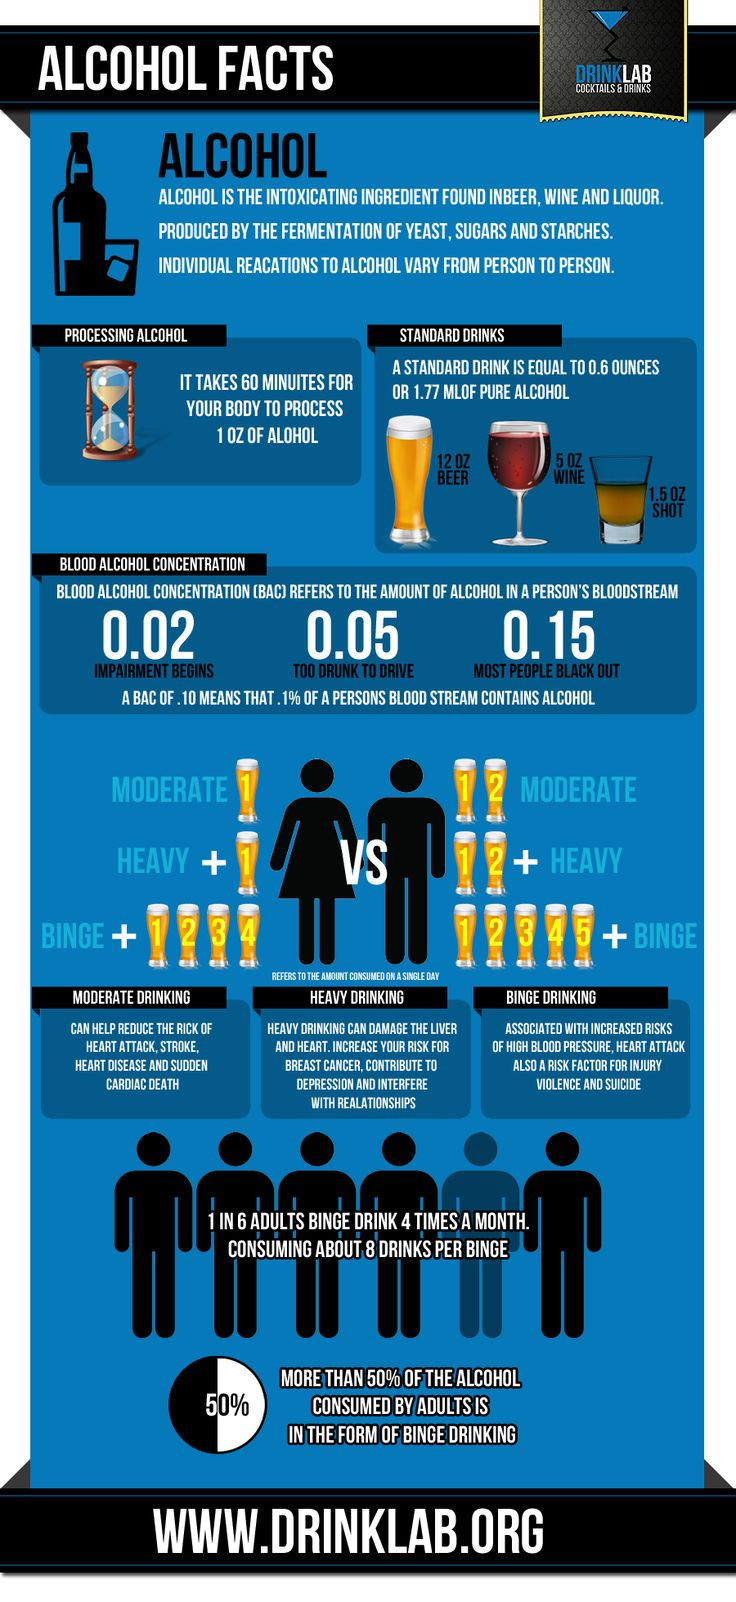 Idea teen alcohol poisoning statistics rather agree